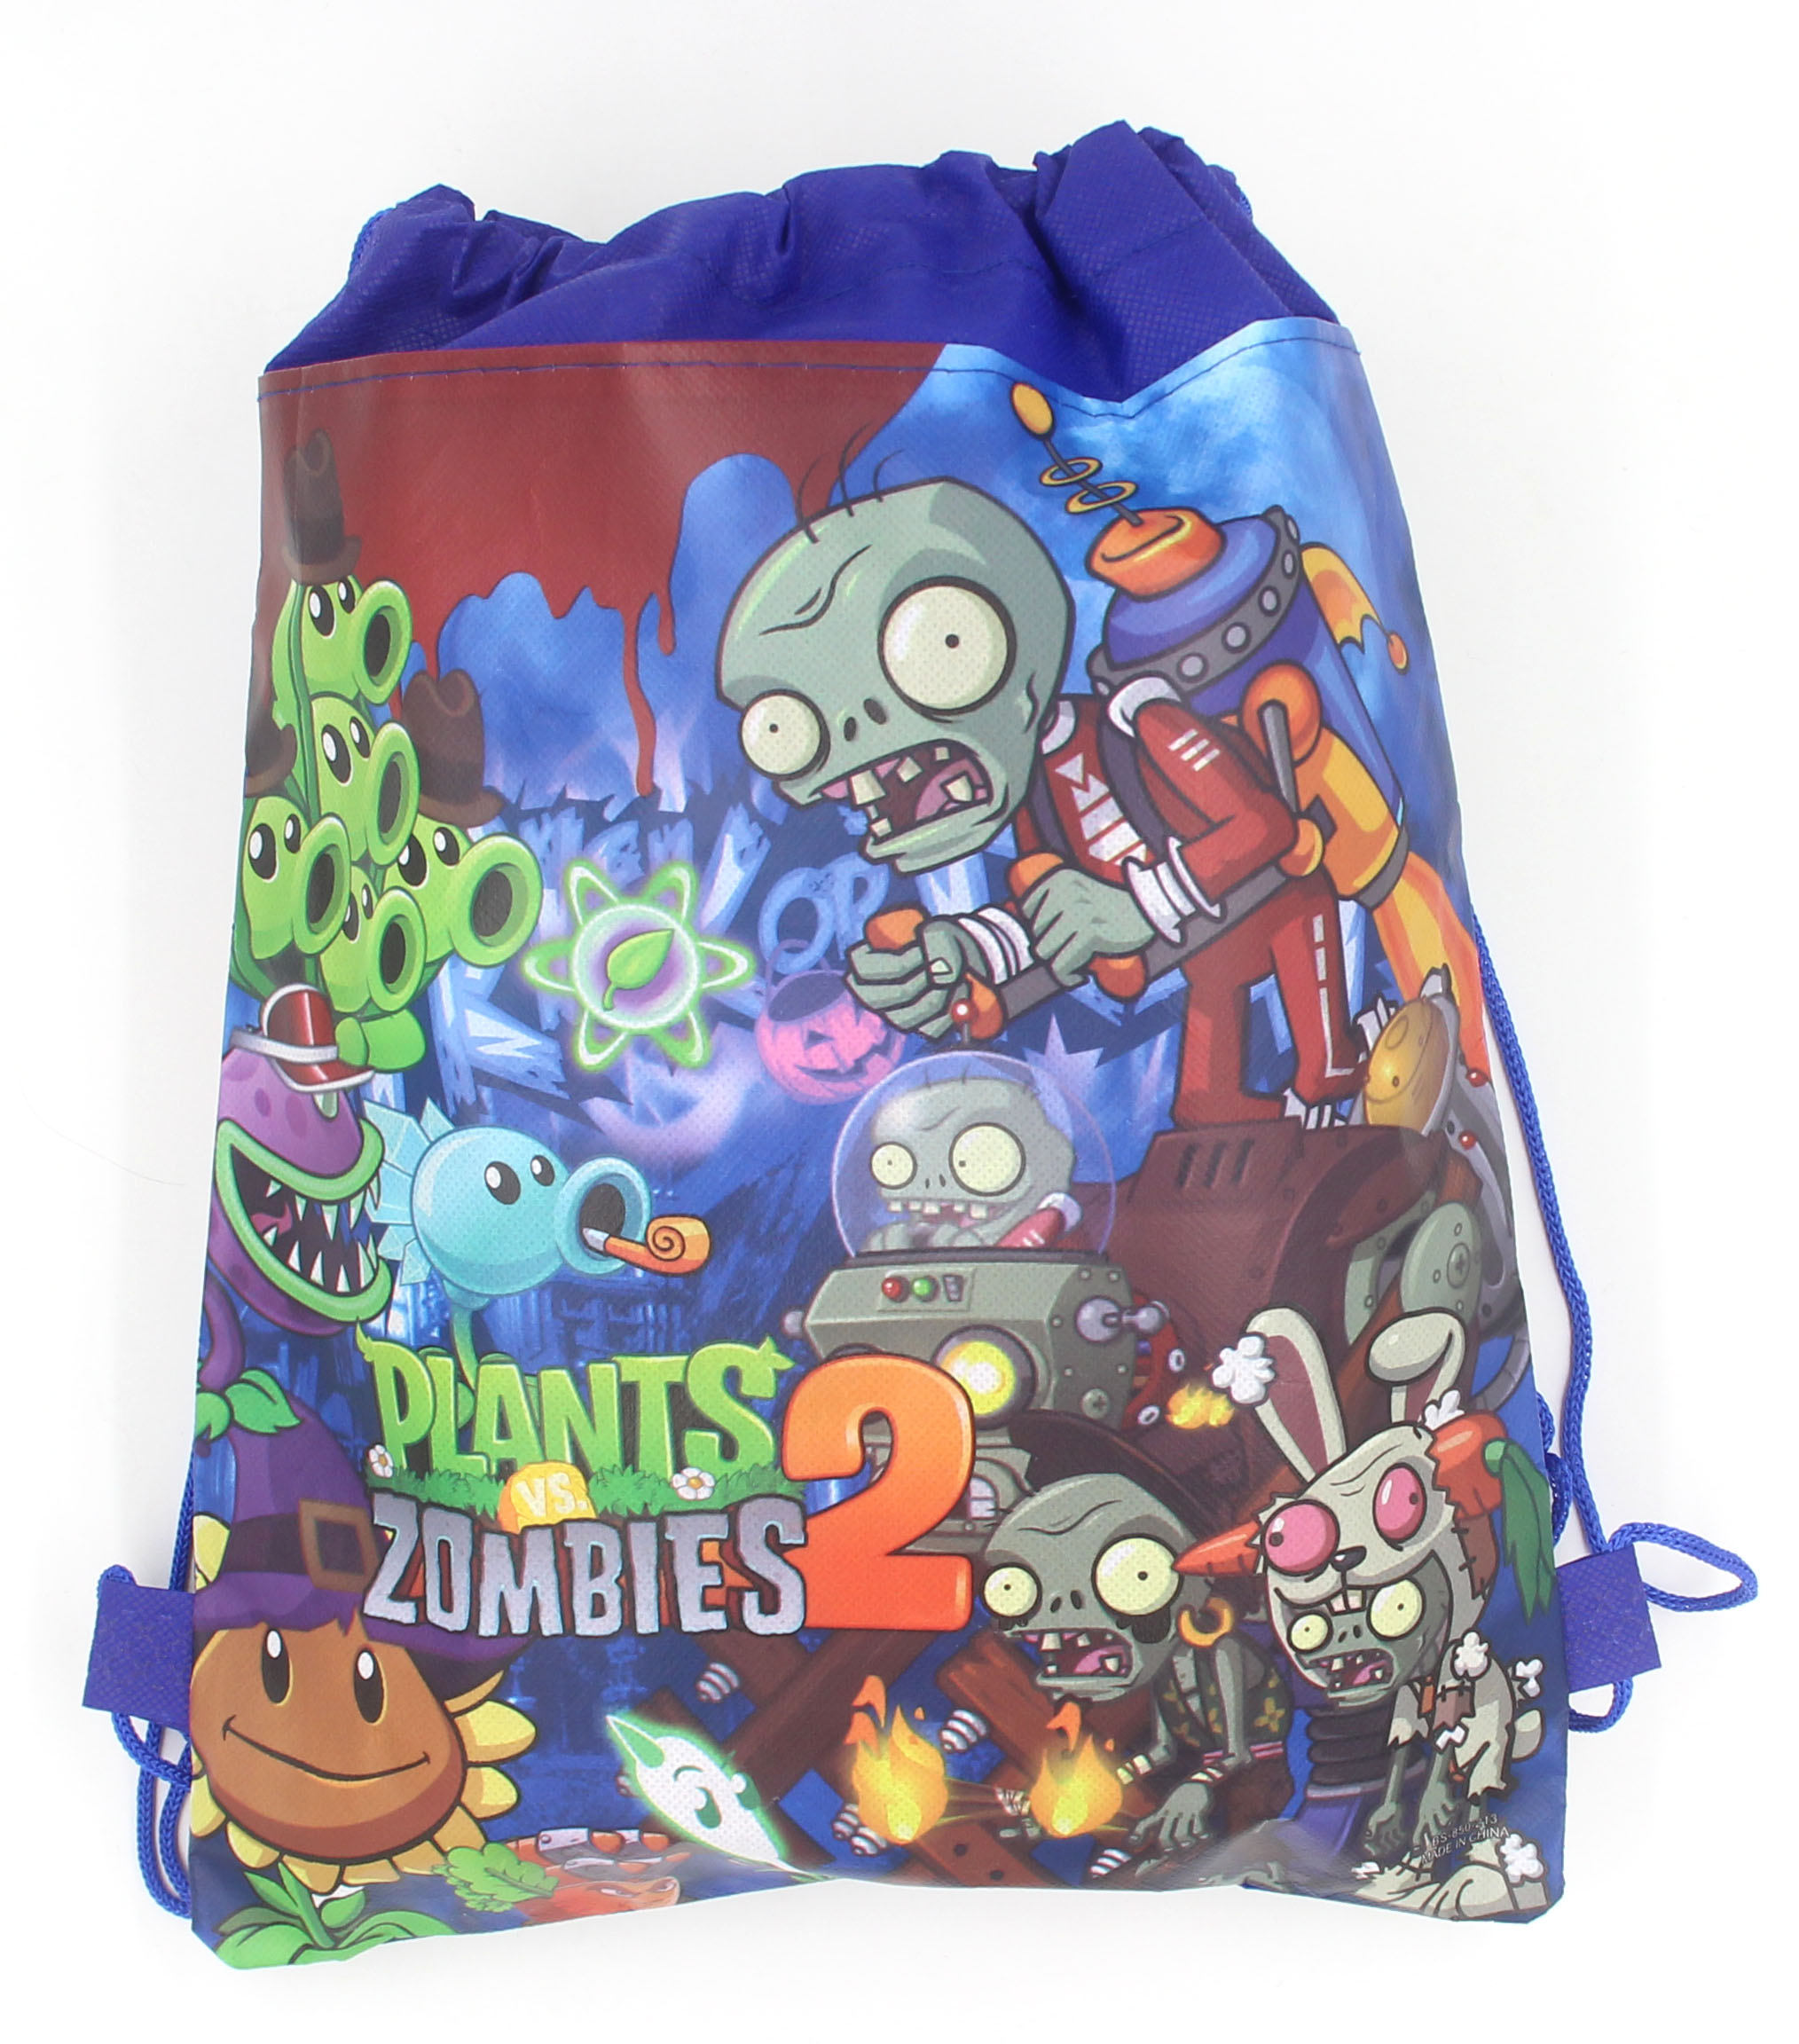 12Pcs New Plants Vs Zombies Drawstring Boys Girls Cartoon School Bag Children Printing School Backpacks For Birthday Party Gifts